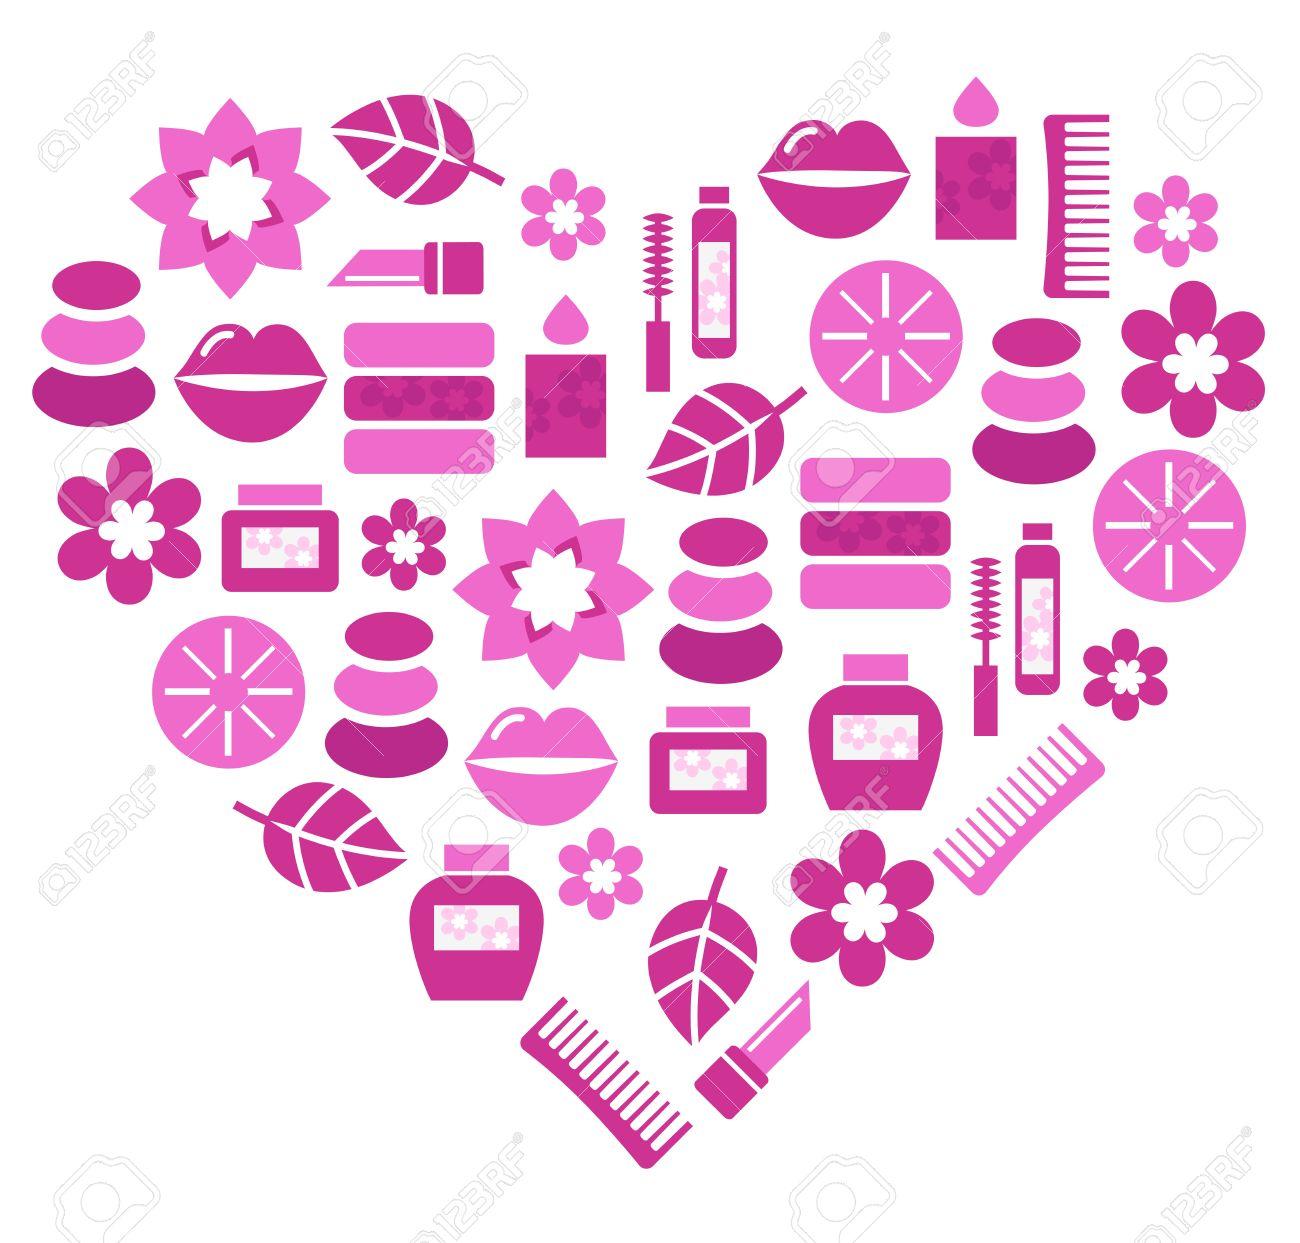 Stylized pink heart. Vector illustration. Stock Vector - 12162858